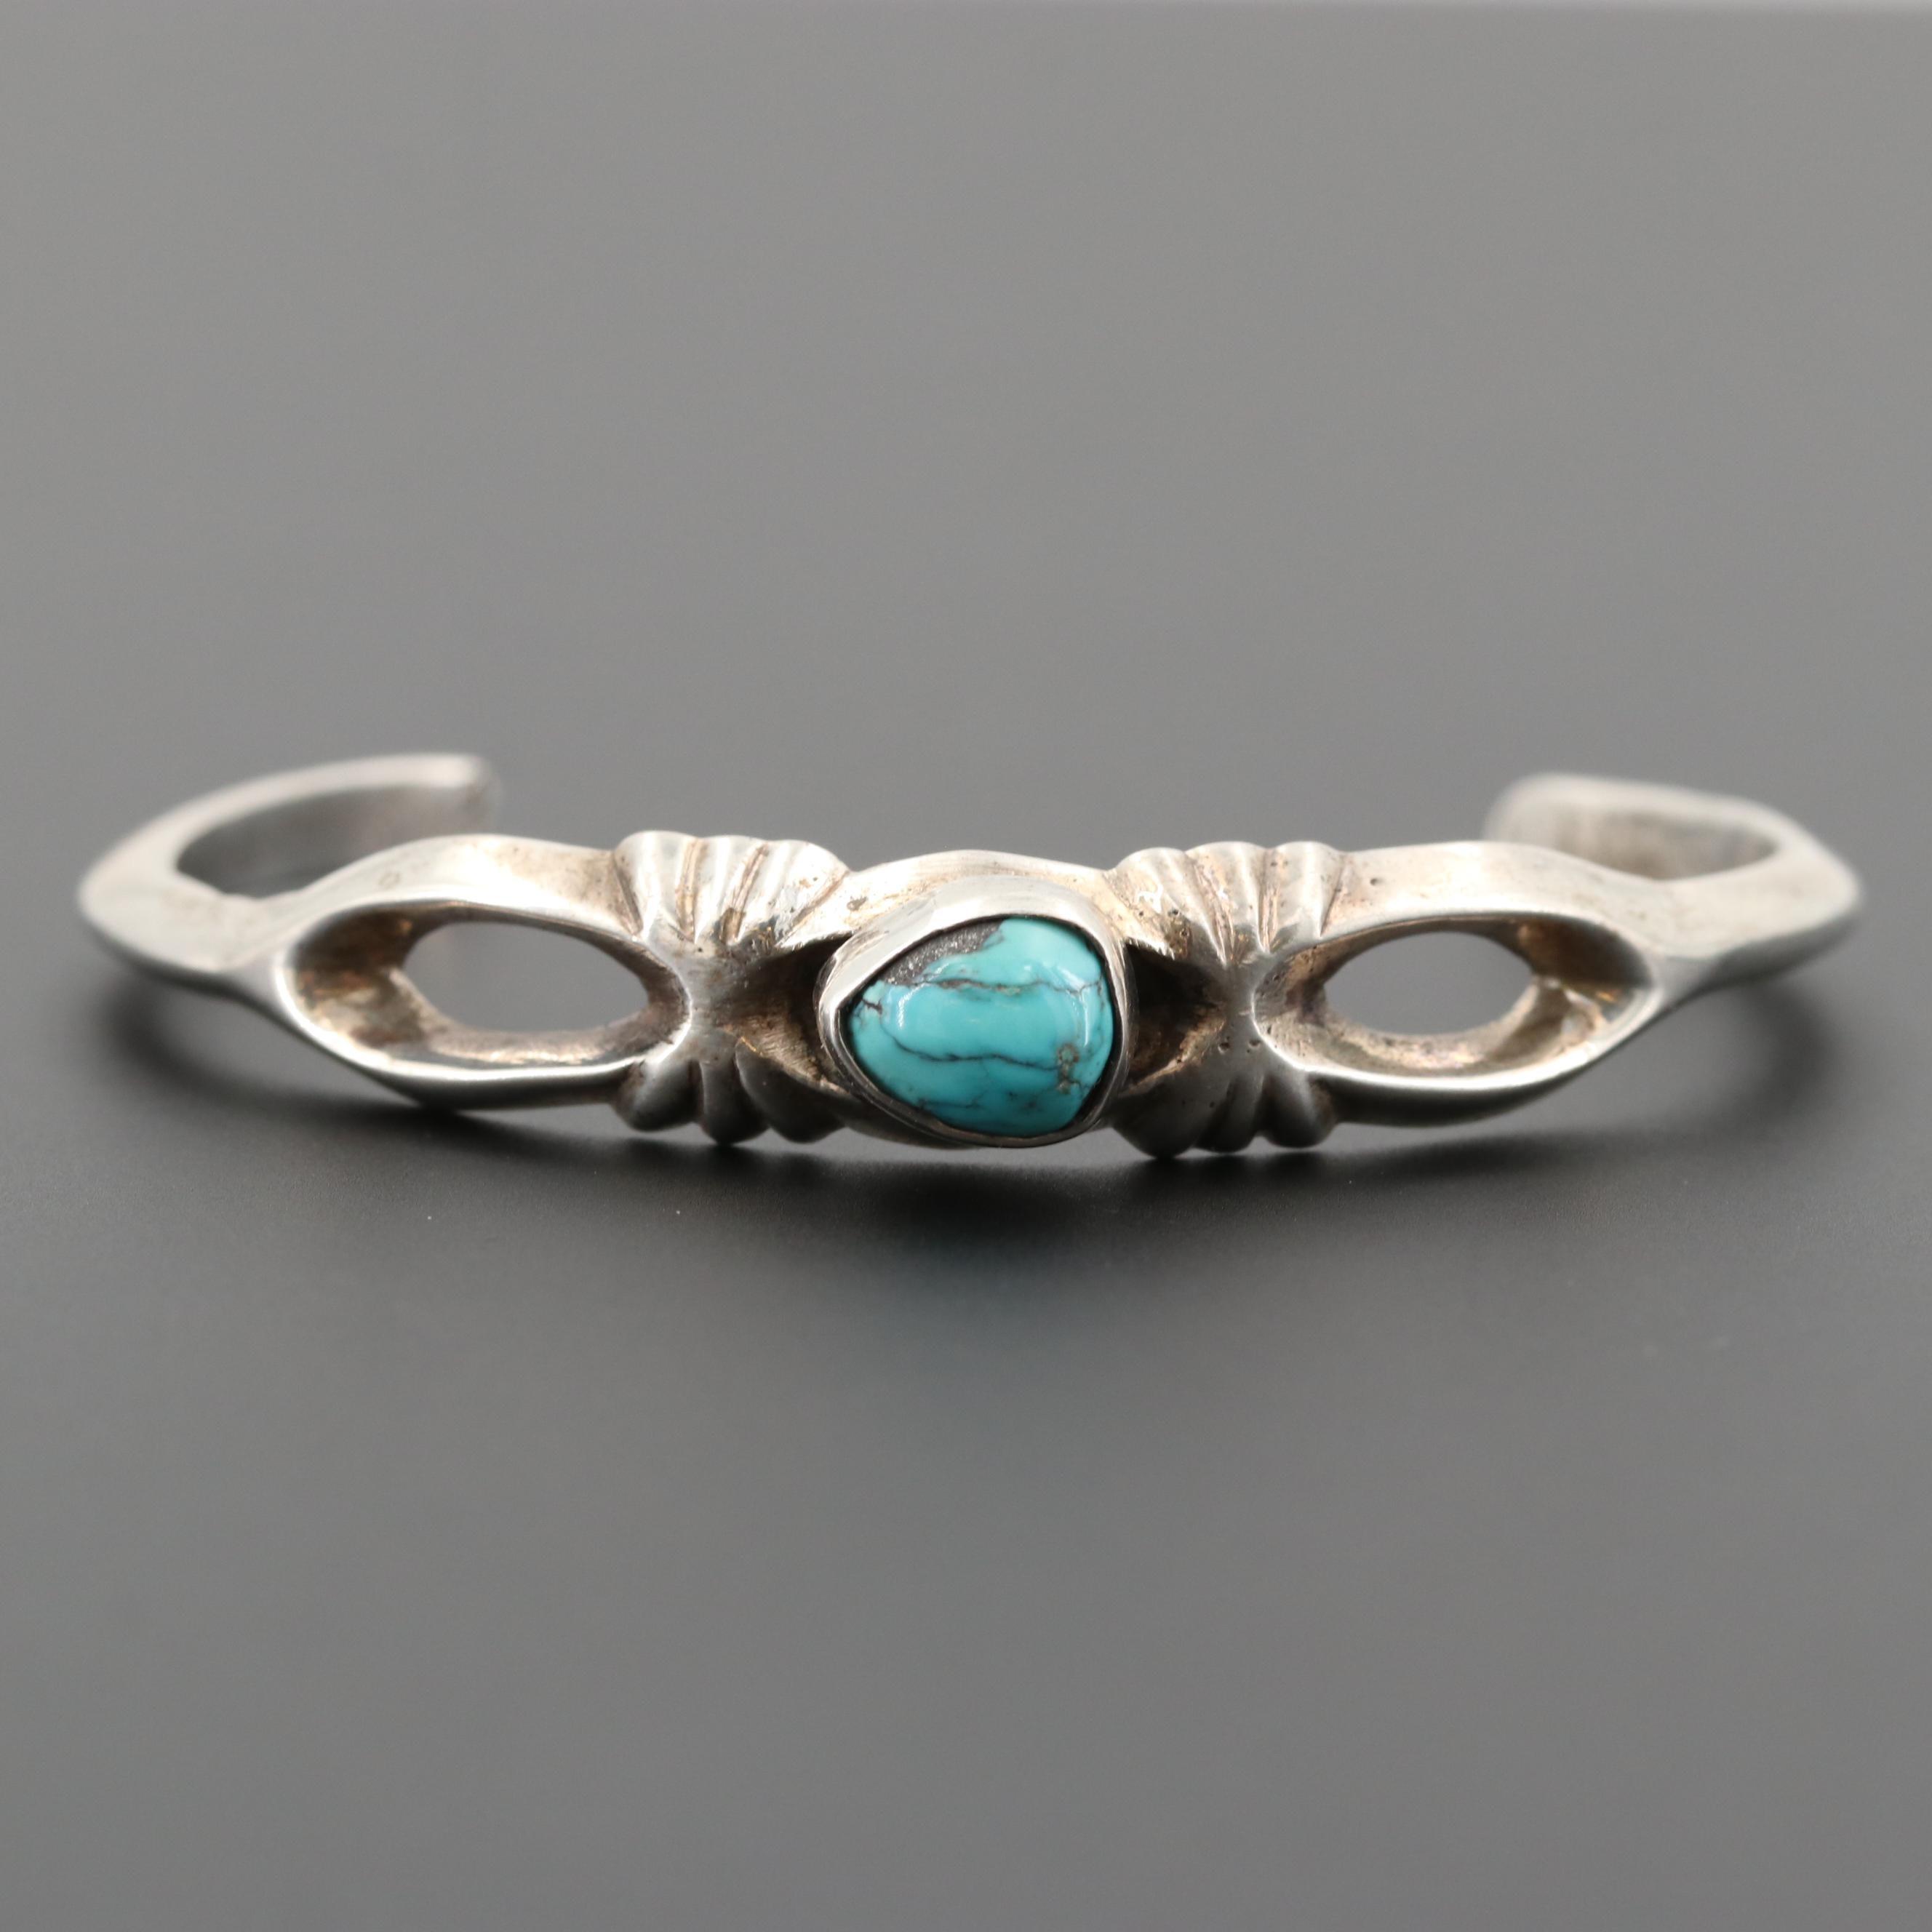 Southwestern Style 800 Silver Turquoise Cuff Bracelet